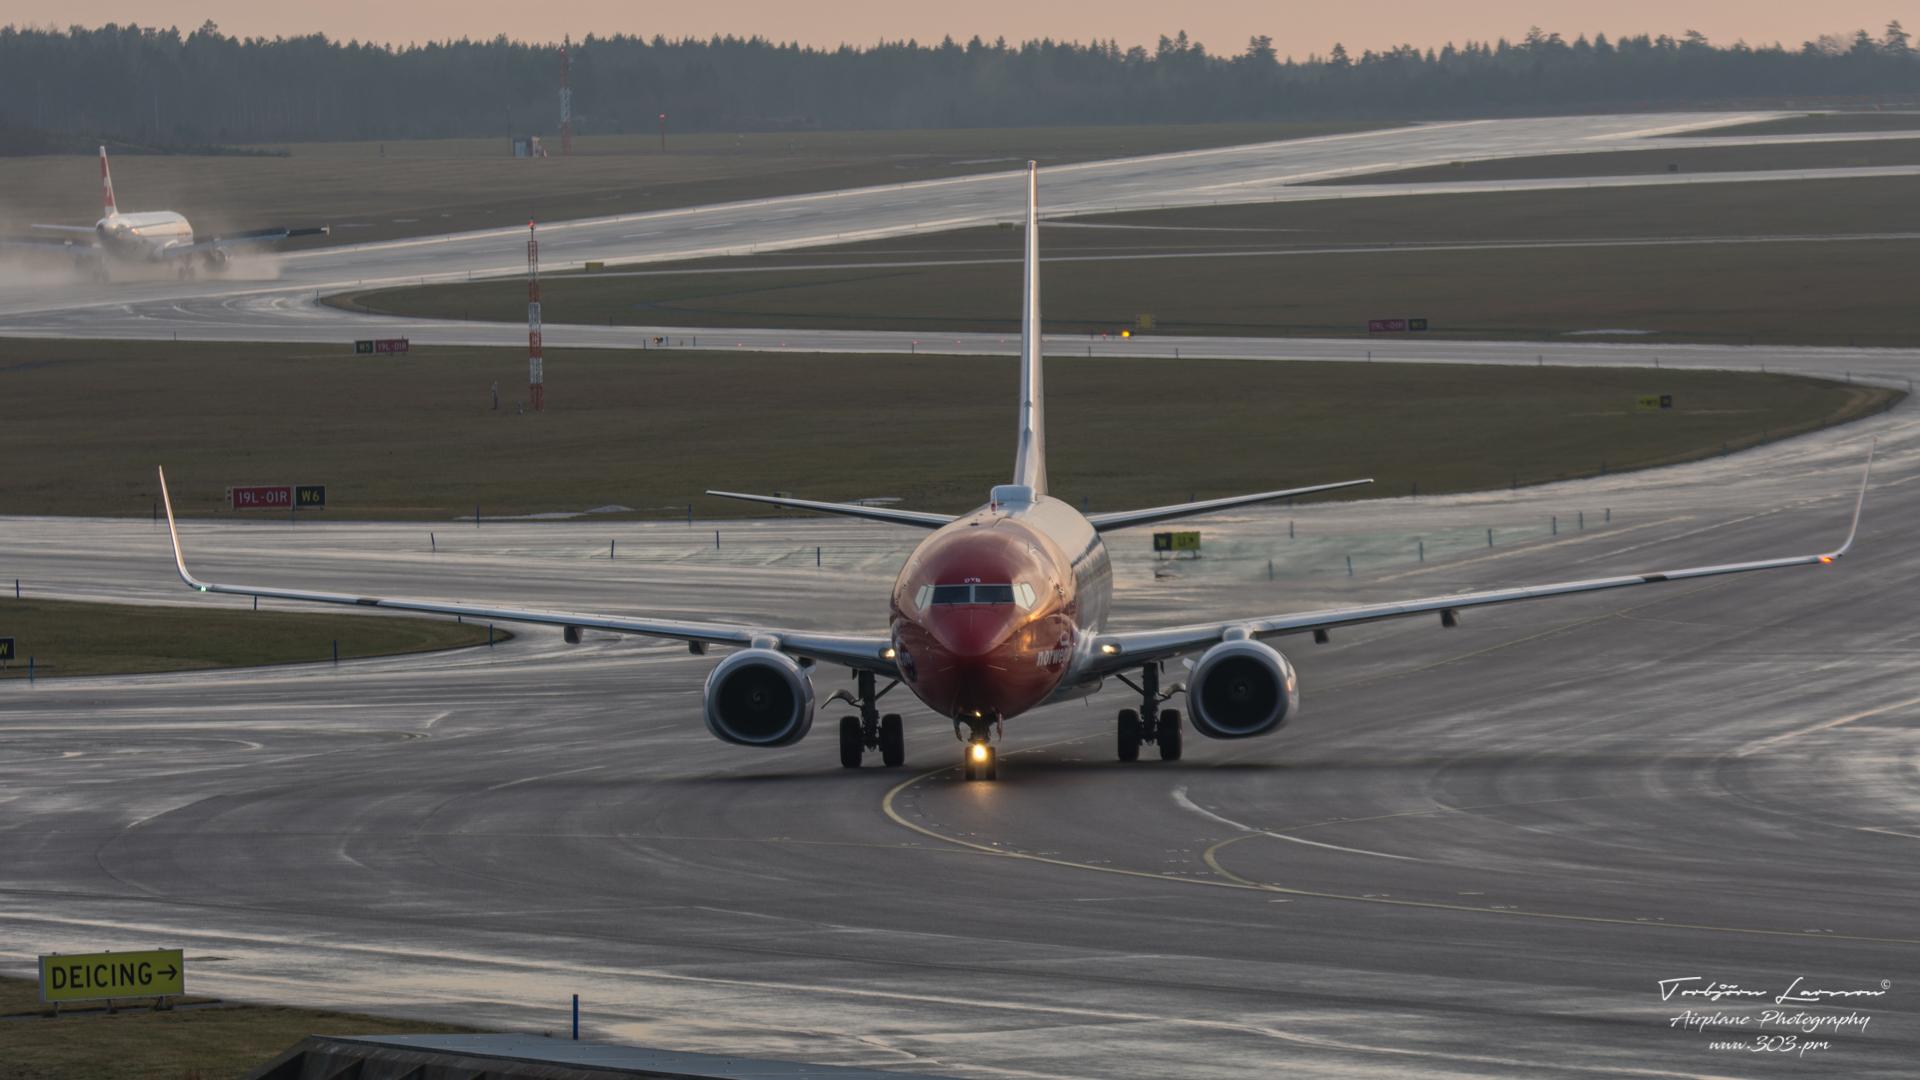 ACE_7552-Boeing 737-8JP - Norwegian LN-DYB & Airbus A320-214 - Swiss Air HB-IJQ